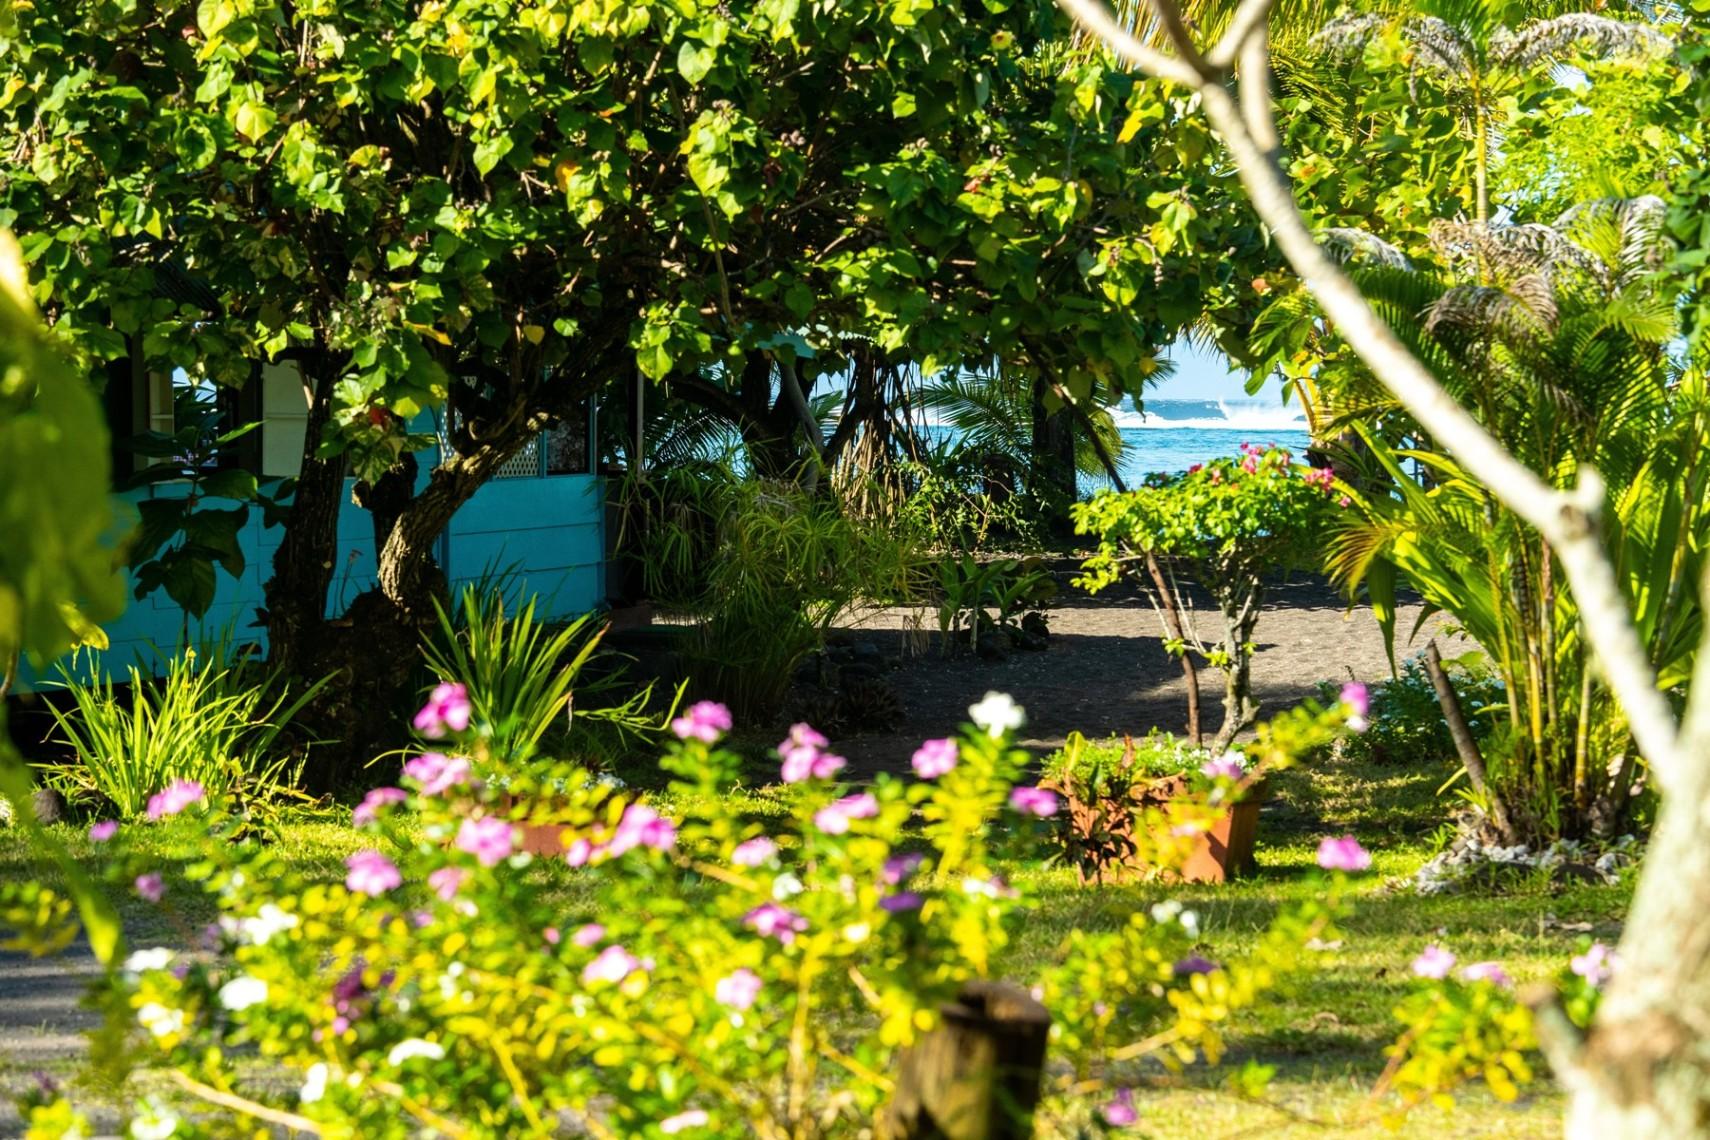 https://tahititourisme.nz/wp-content/uploads/2019/08/copie-tahiti-tourisme-800ko-1.jpg